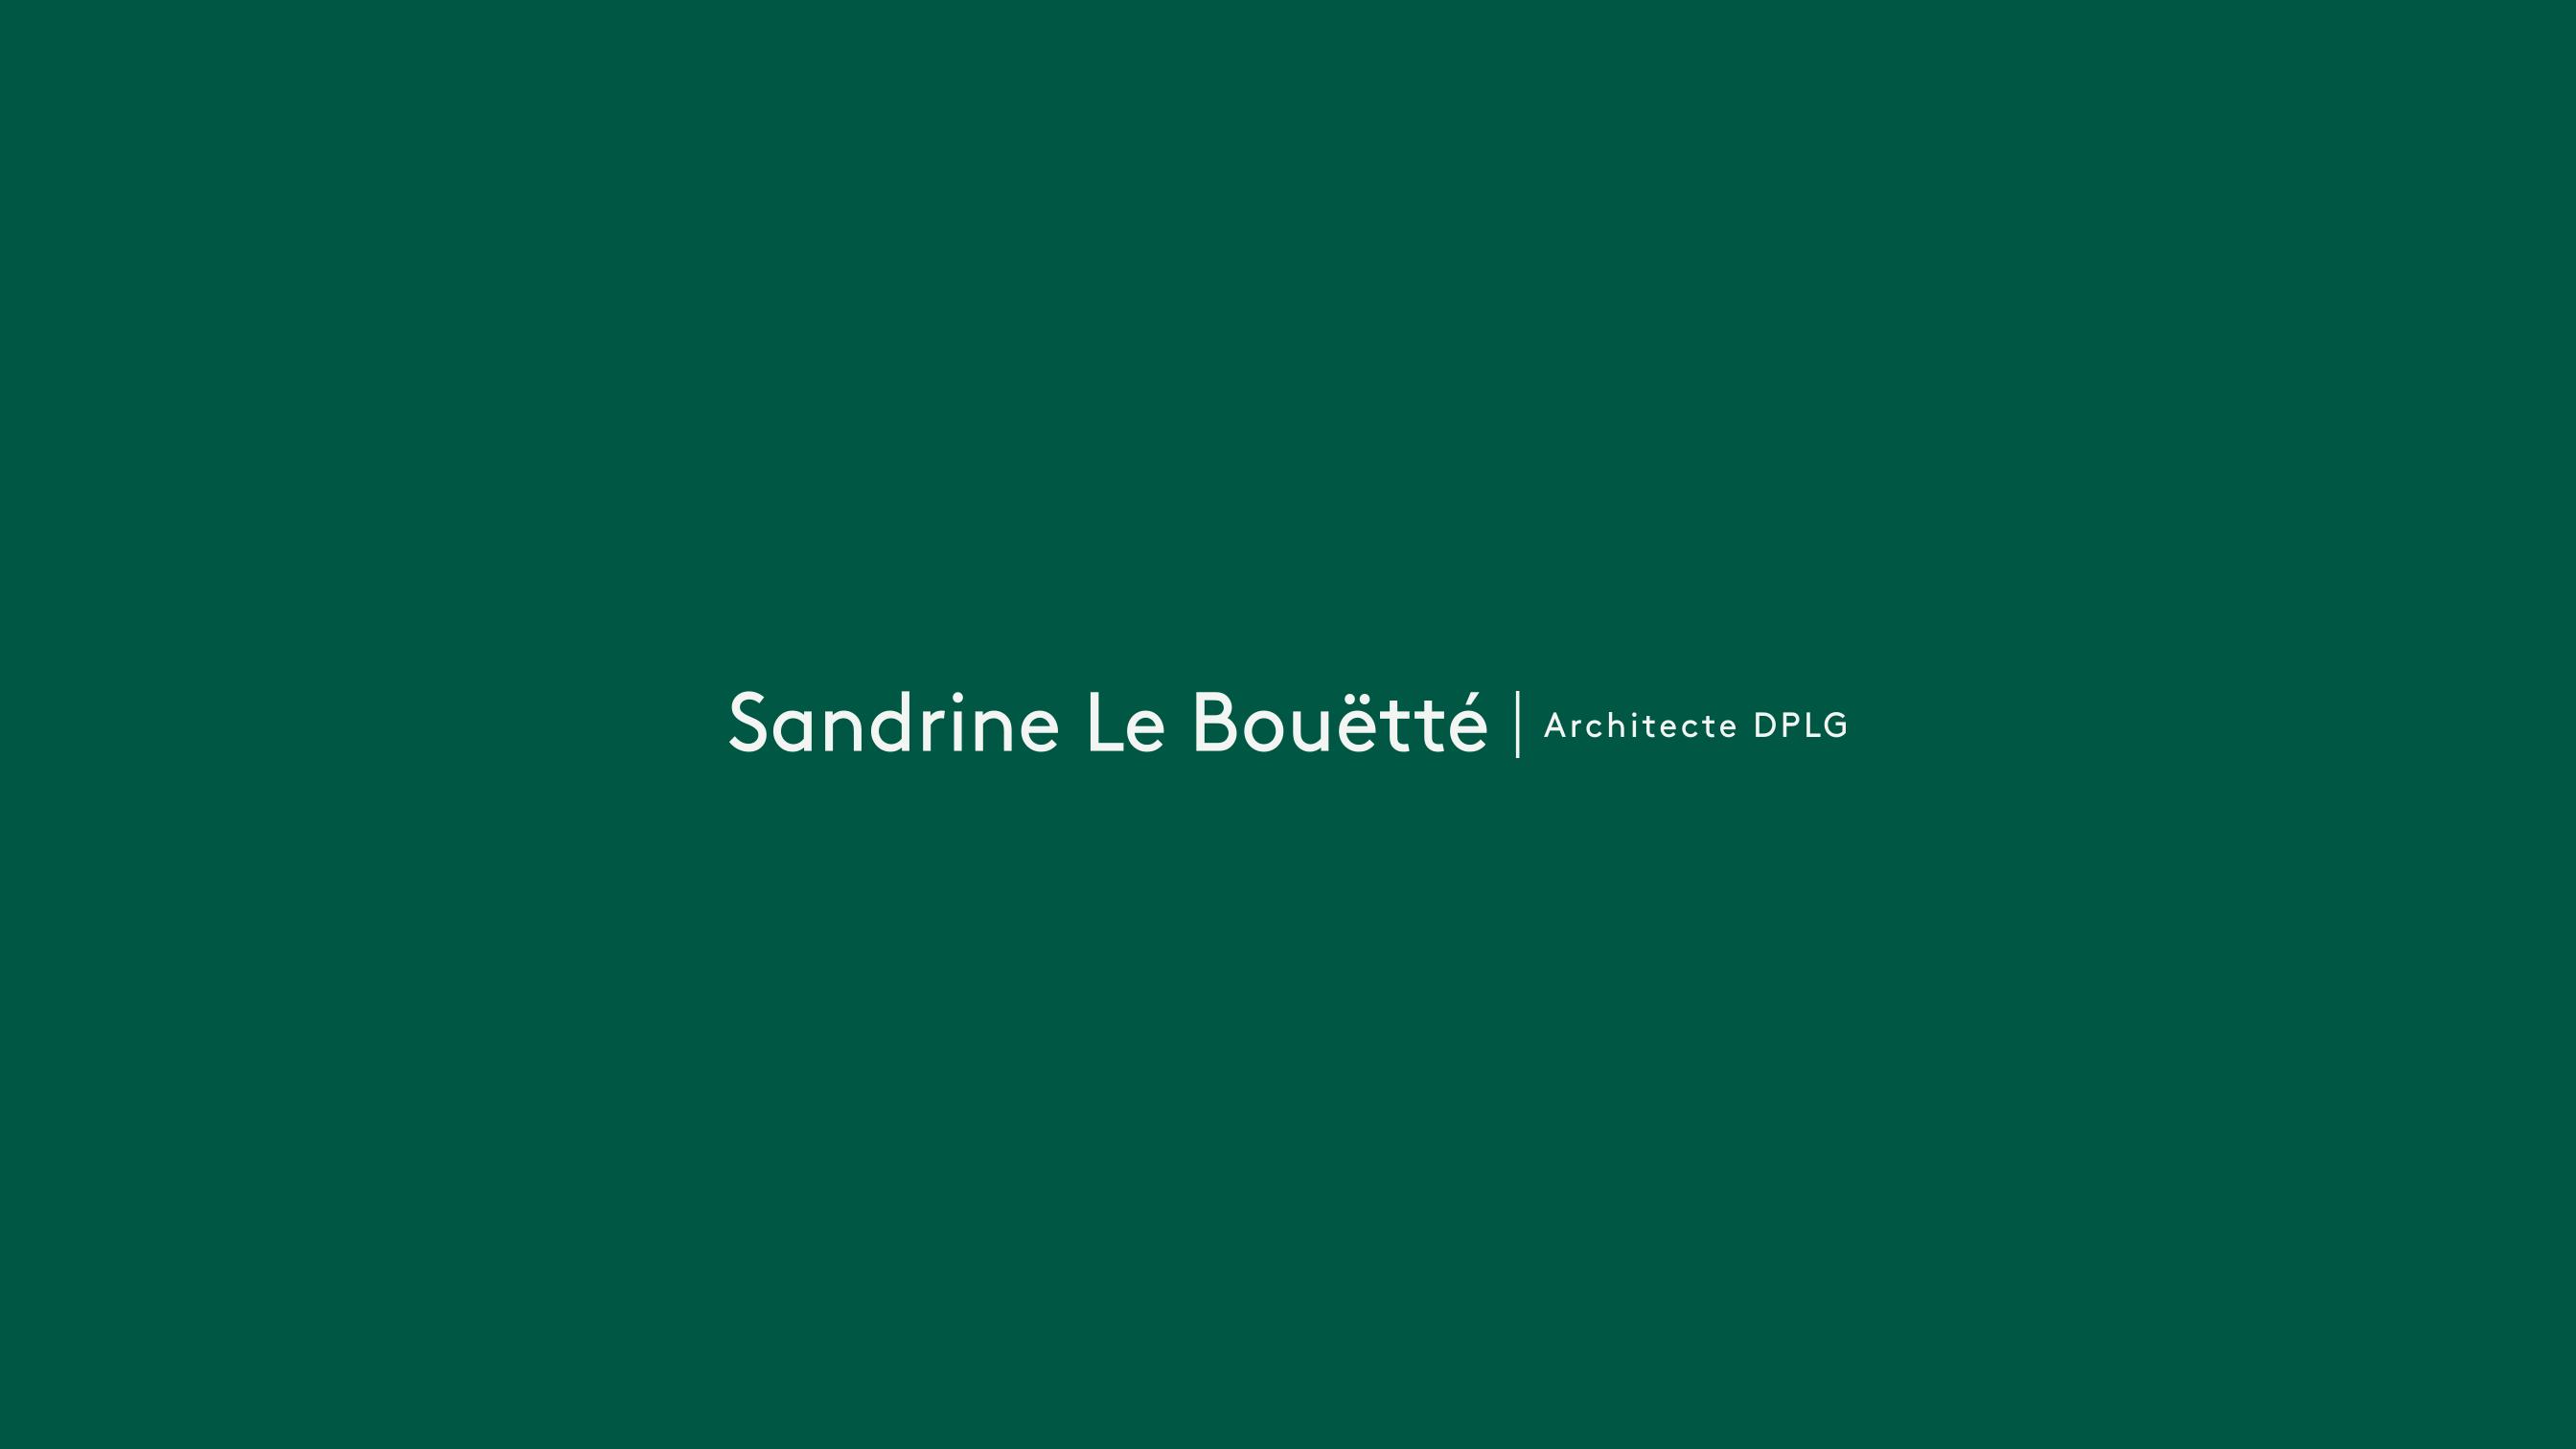 01-slb-architecte-logo-pikteo-webdesign-graphic-design-freelance-paris-bruxelles-londres